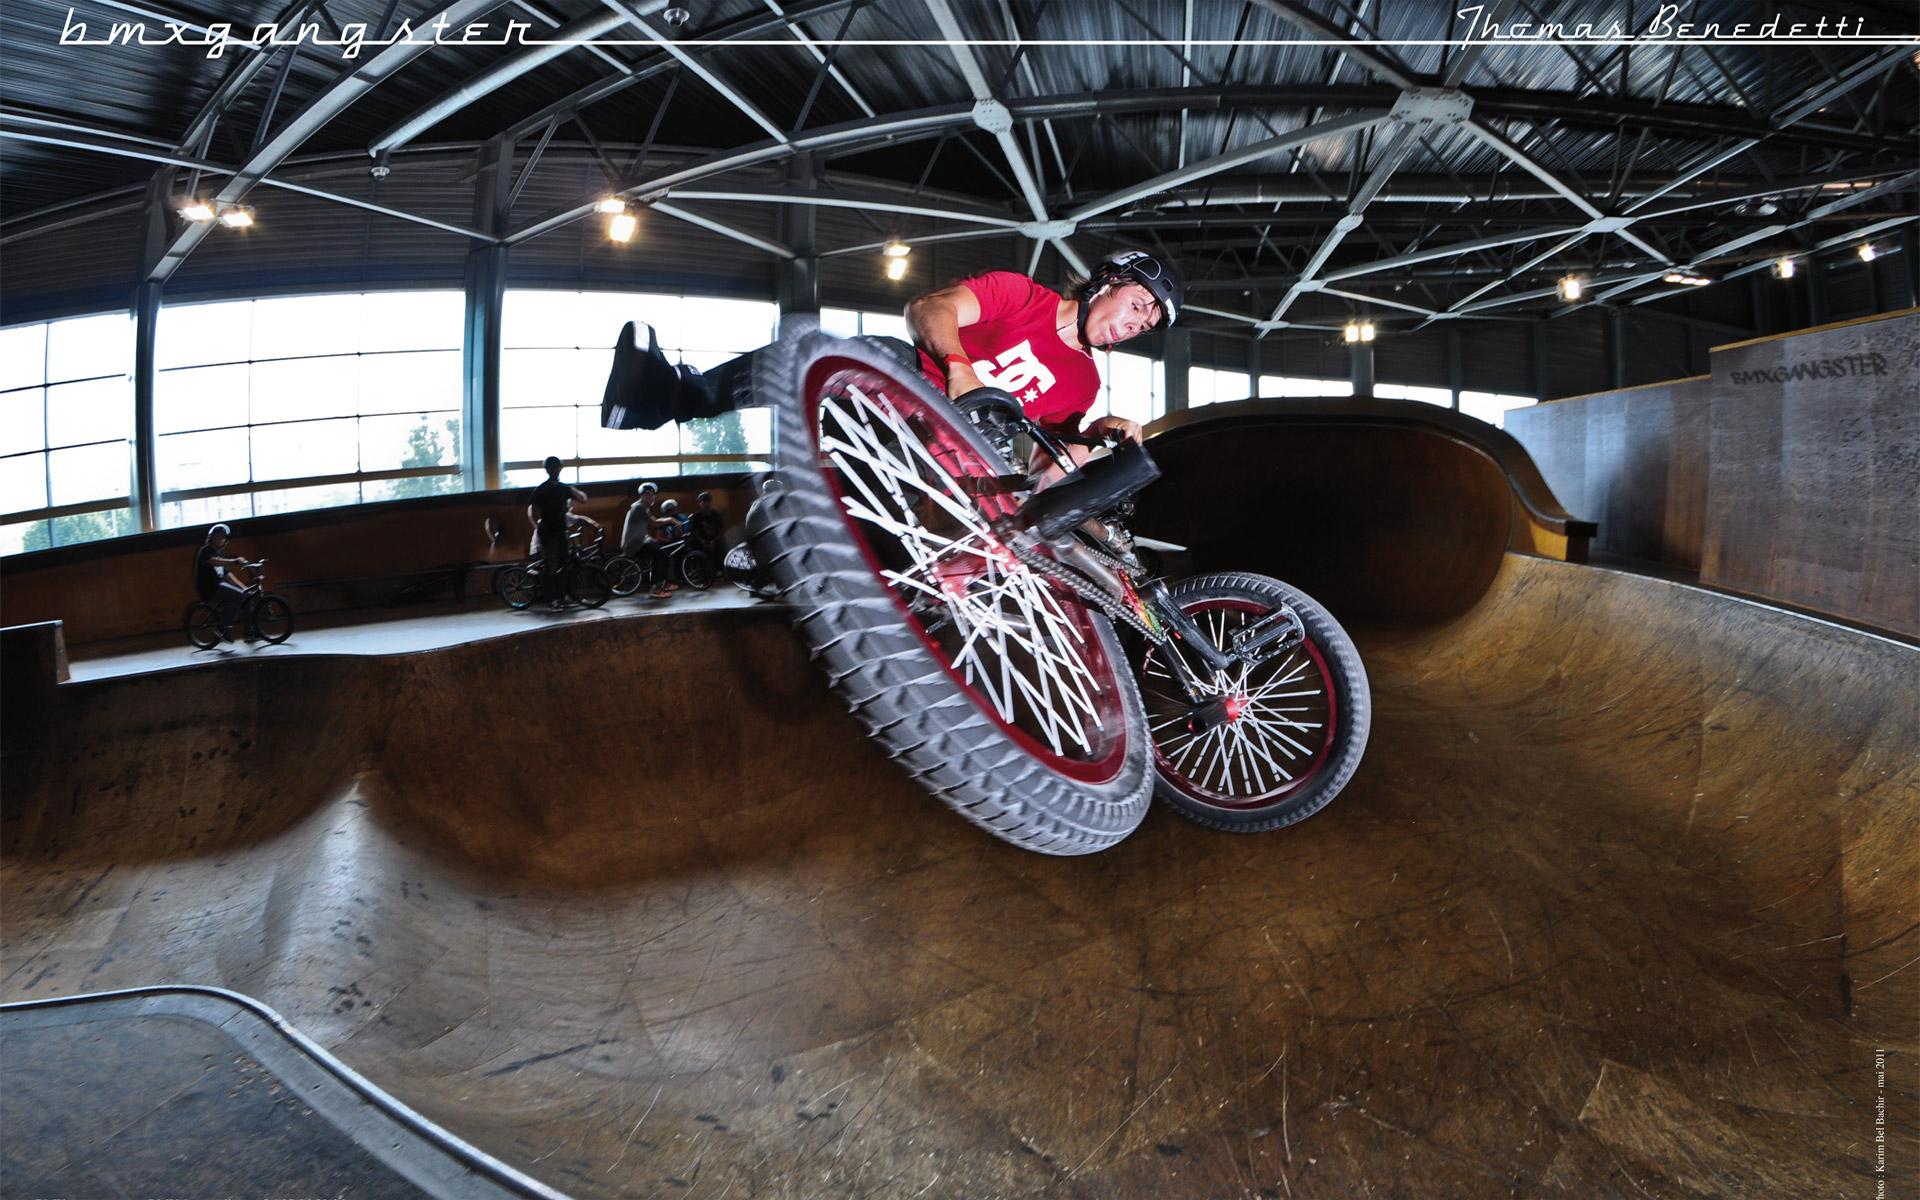 Wallpapers Sports - Leisures BMX bmxgangster team - thomas benedetti